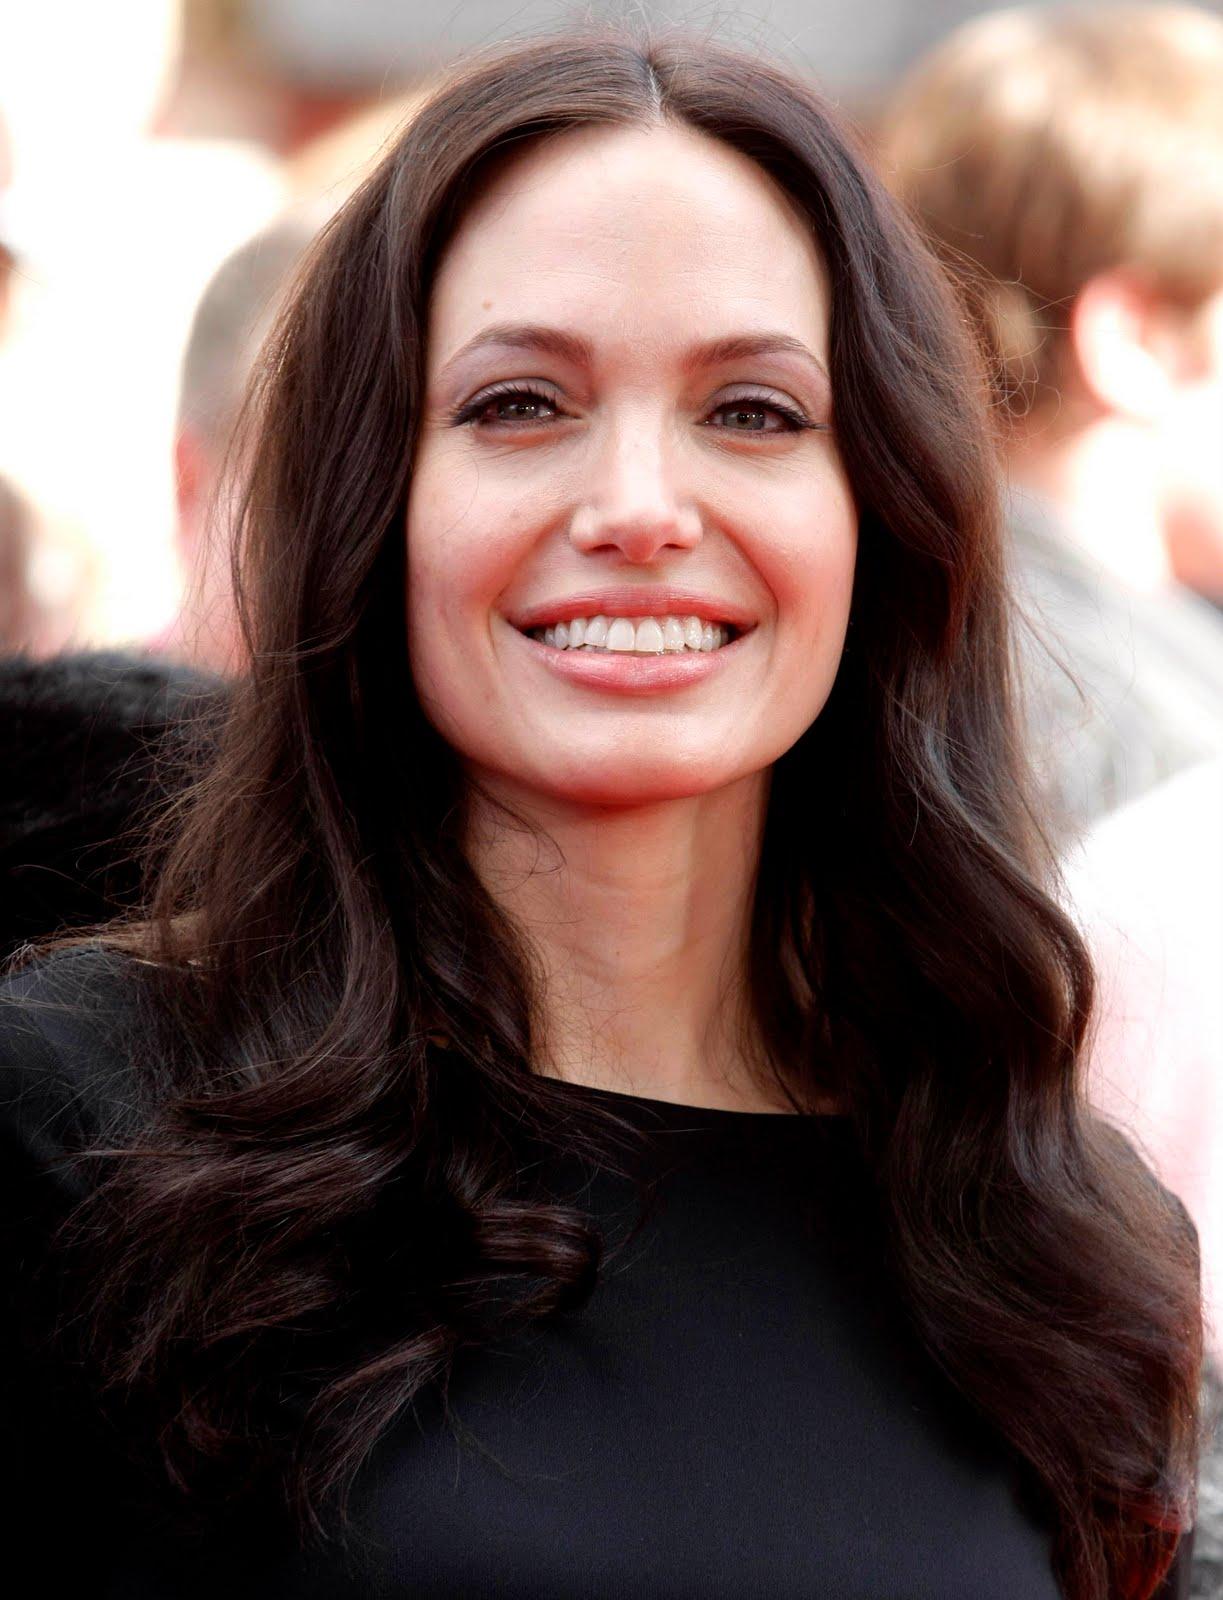 http://4.bp.blogspot.com/-l1US9LUnwhs/Tcqty5oge9I/AAAAAAAAECs/T4VuCKeMFv8/s1600/Angelina-Jolie.JPG